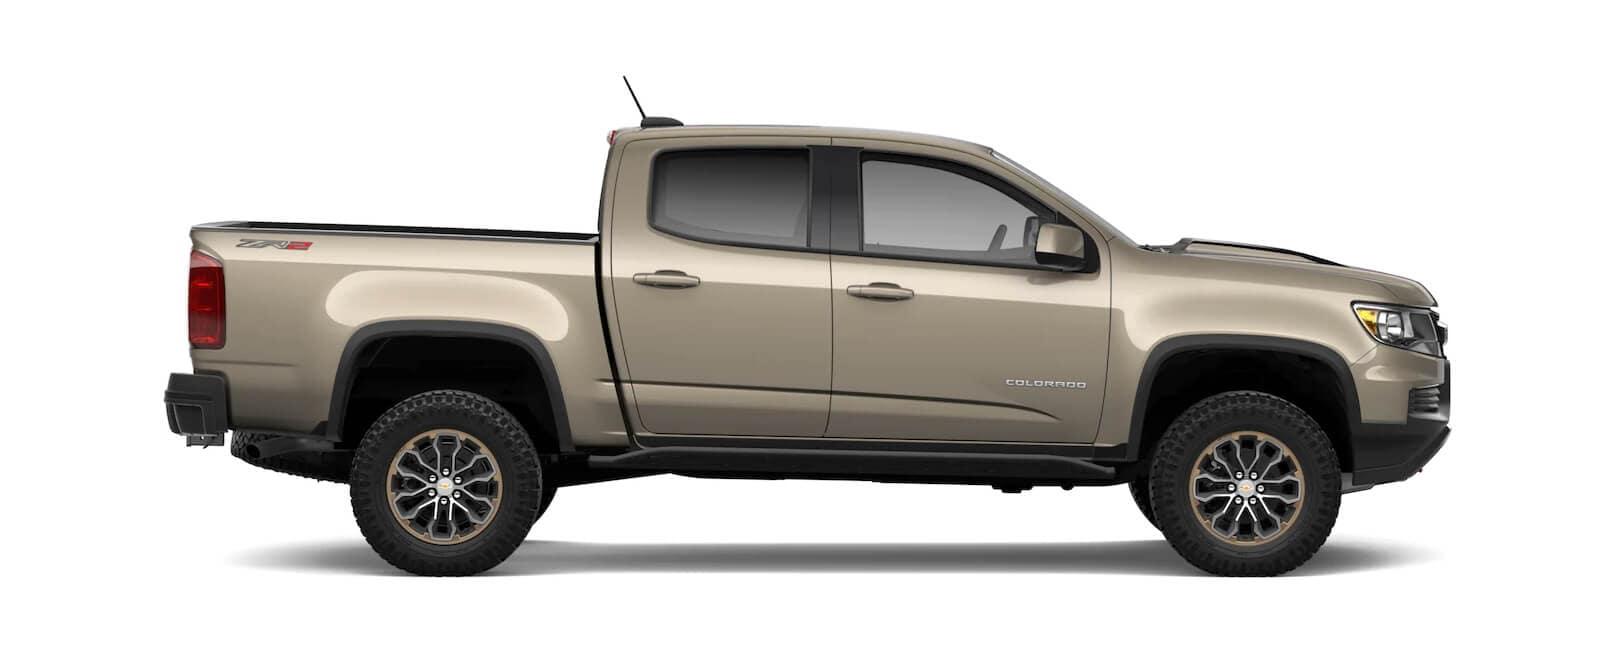 New Chevrolet Vehicles: 2021 Colorado